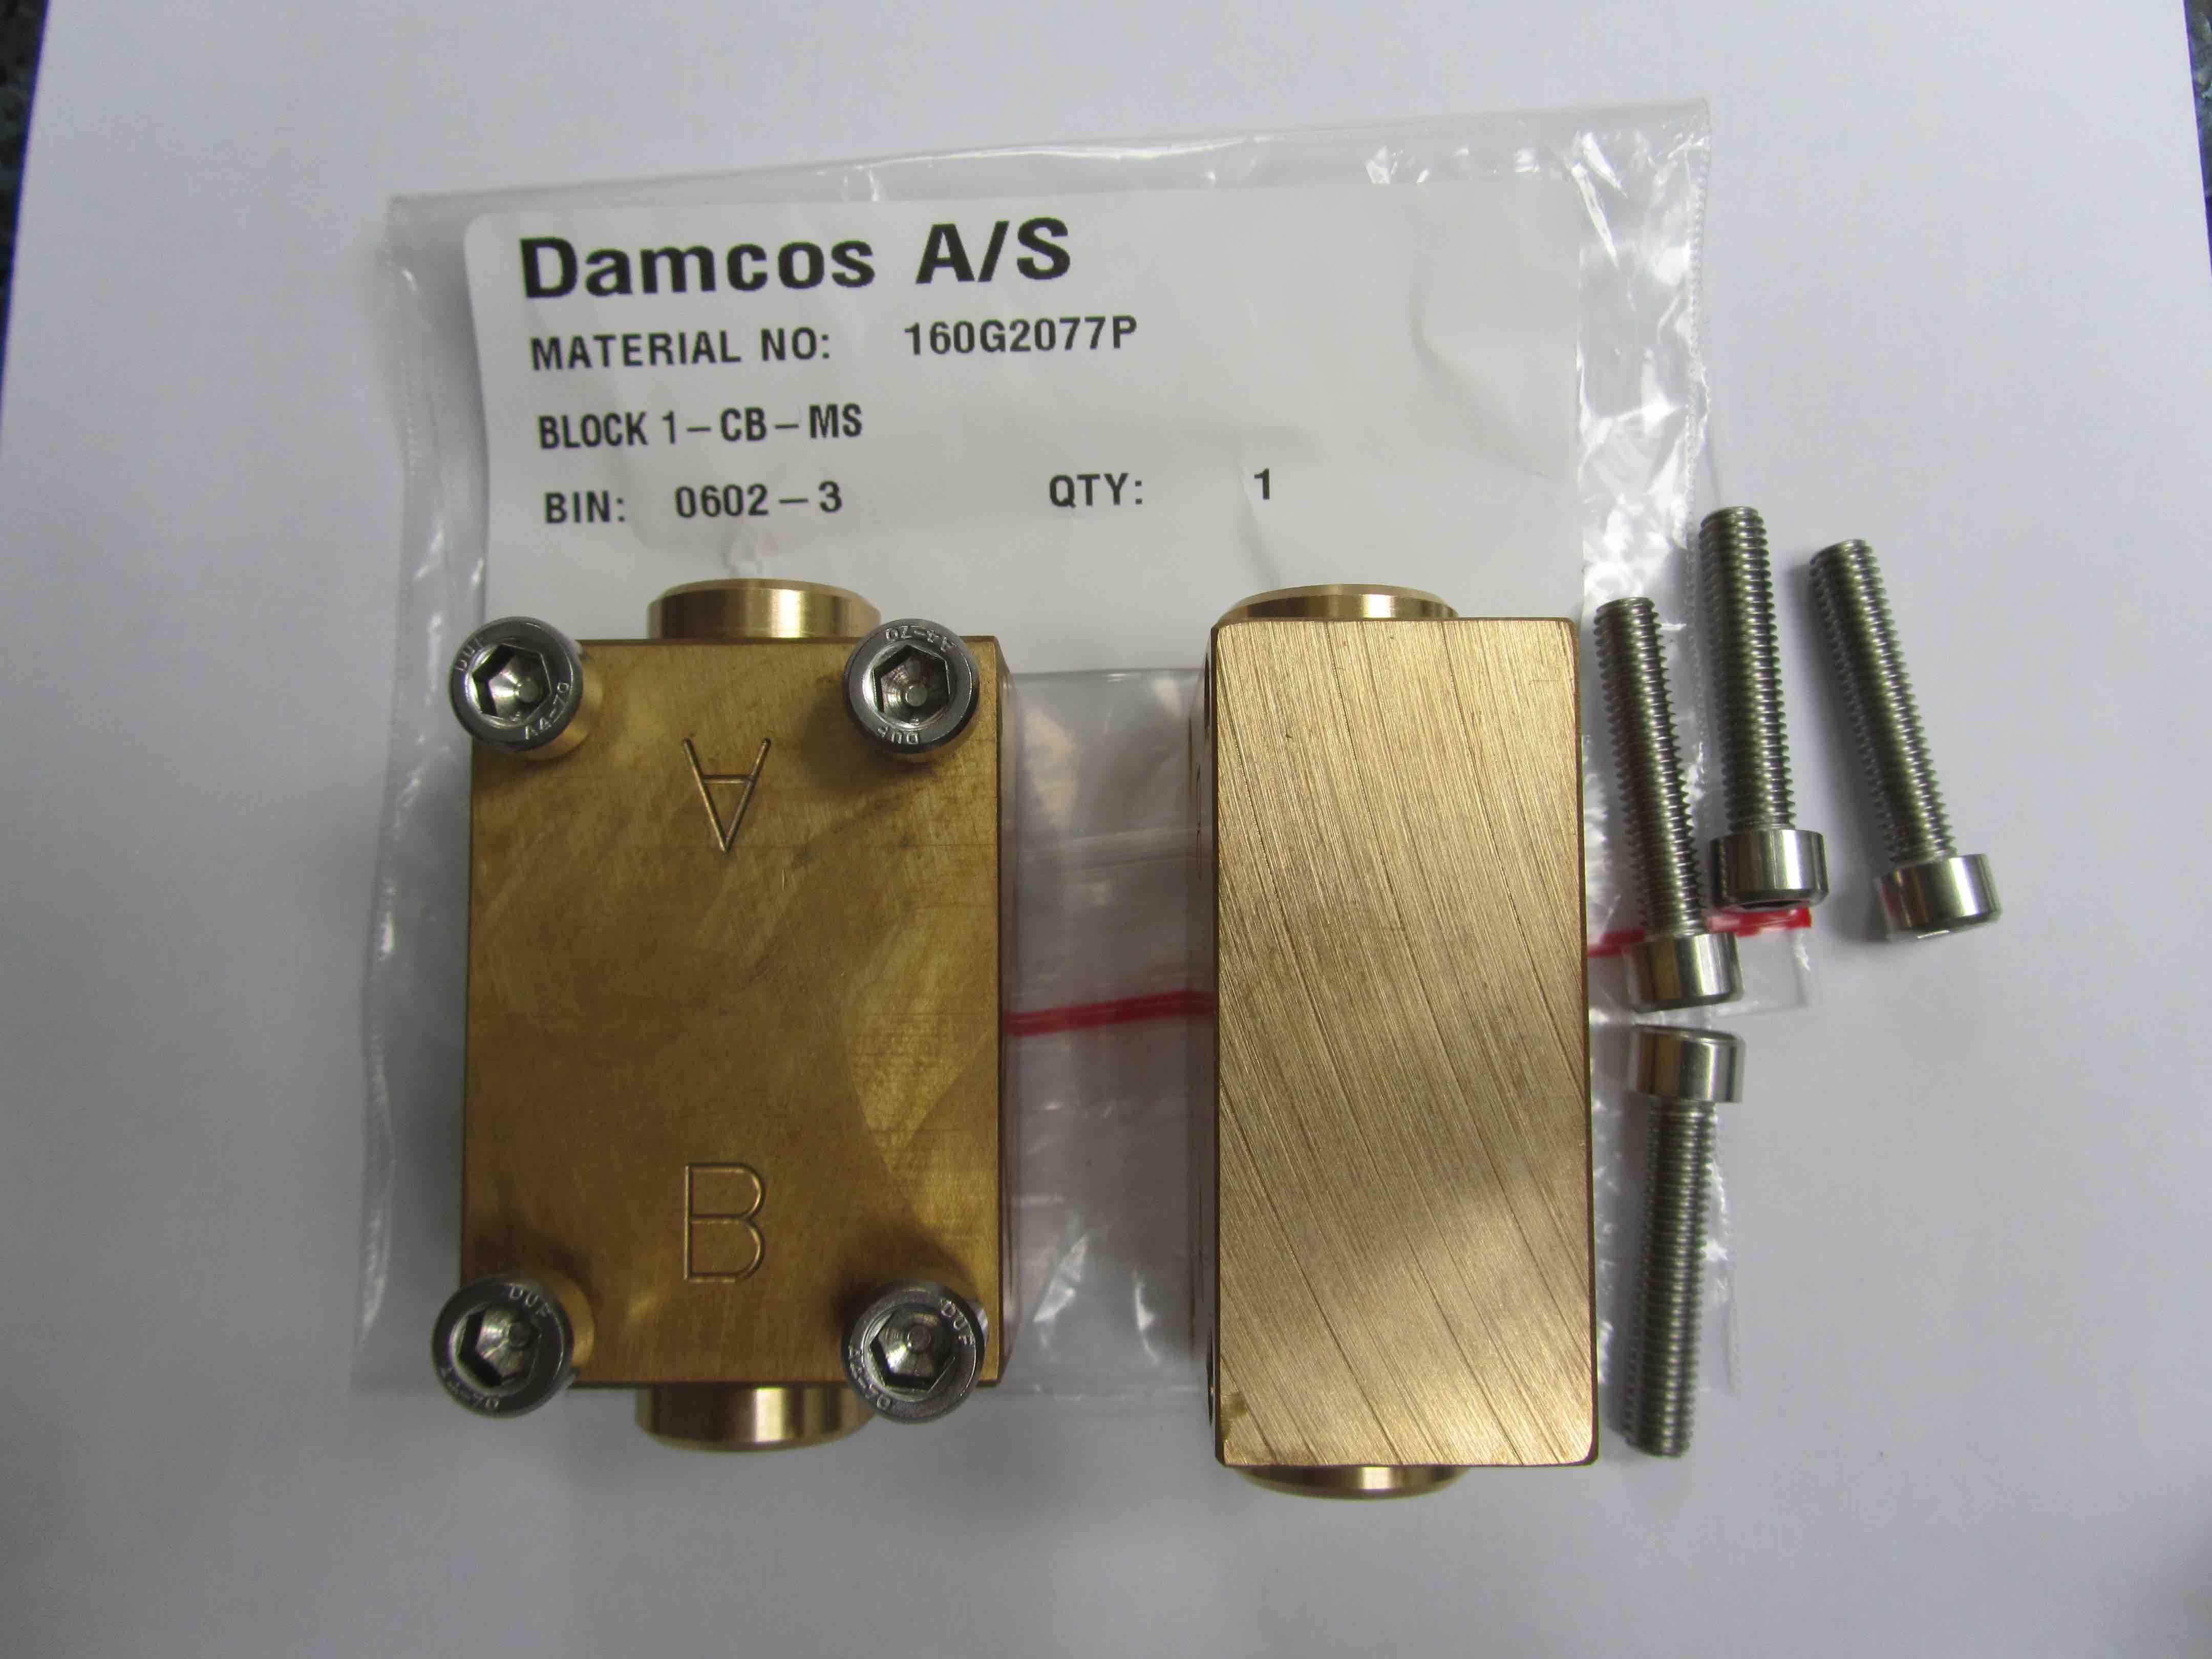 160G2077:P Damcos 1-CB-MS